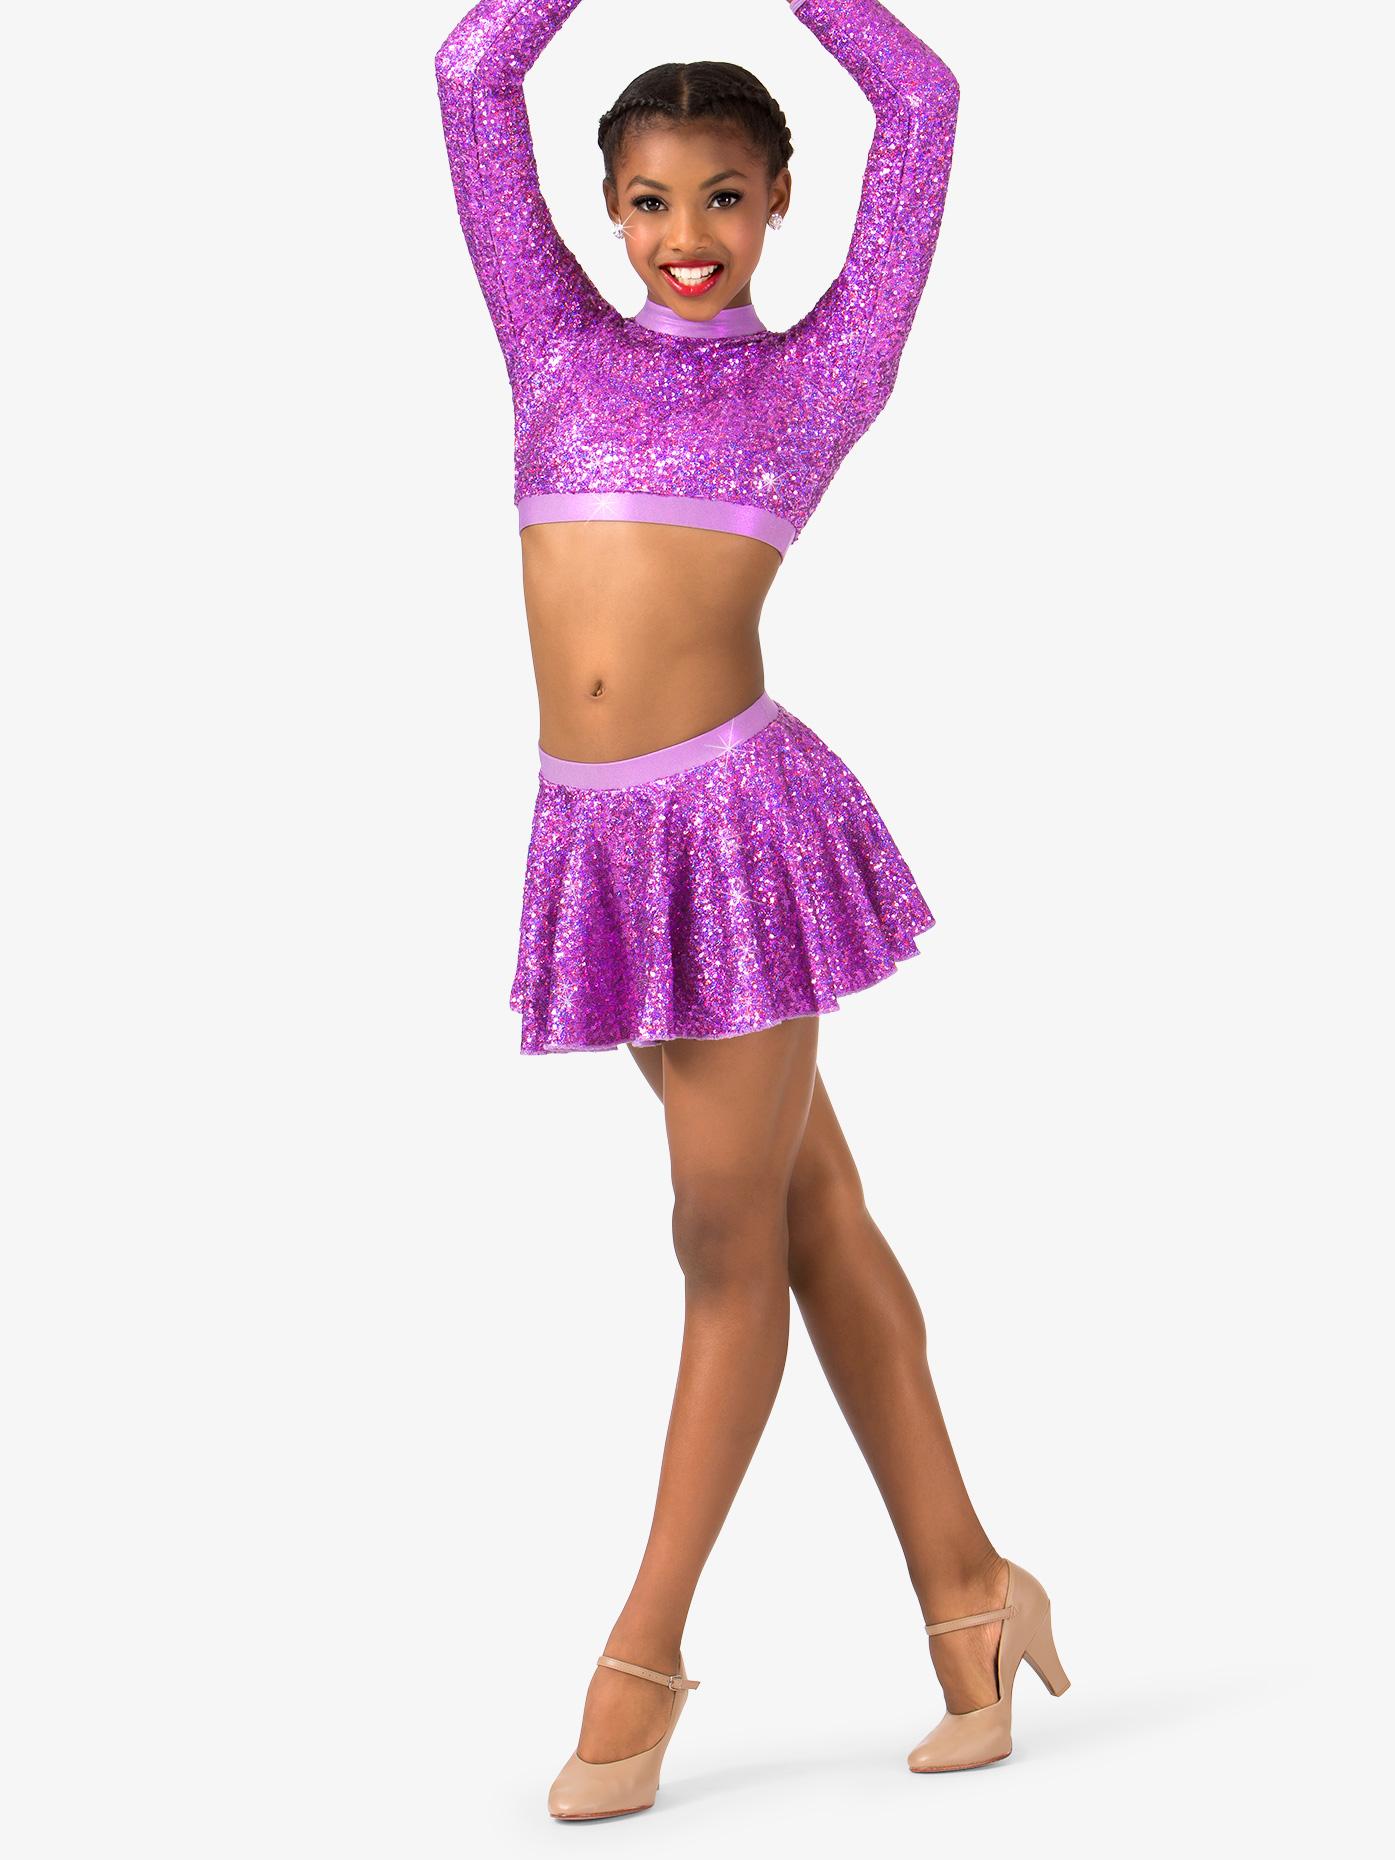 Double Platinum Womens Plus Size Sequin Skater Performance Skirt N7390P